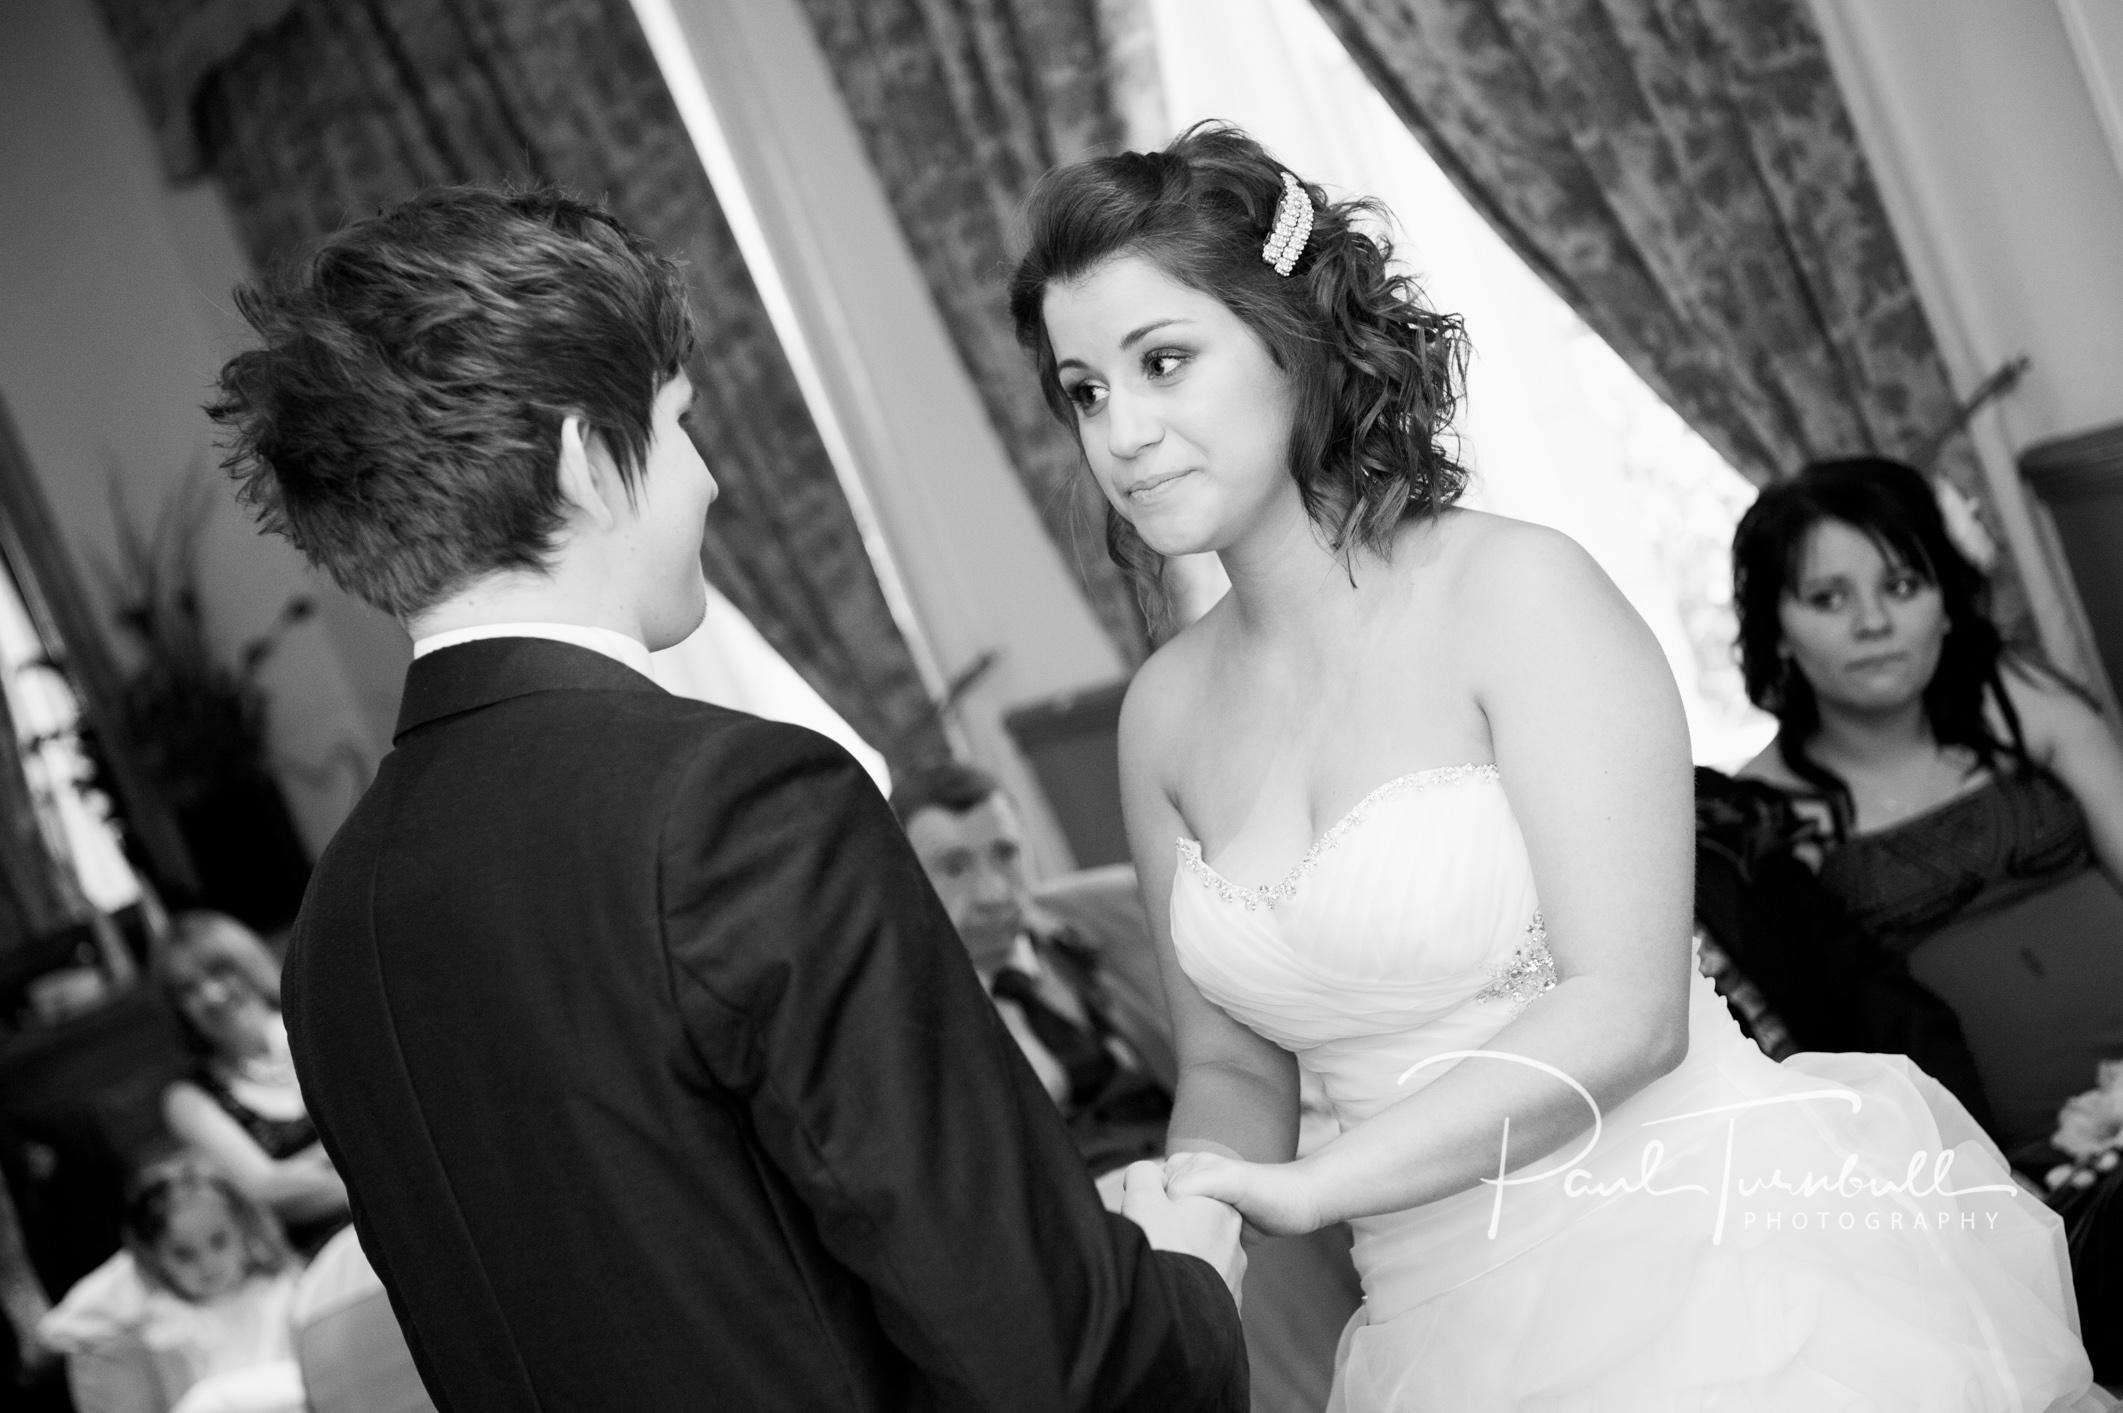 wedding-photography-healds-hall-liversedge-yorkshire-045.jpg